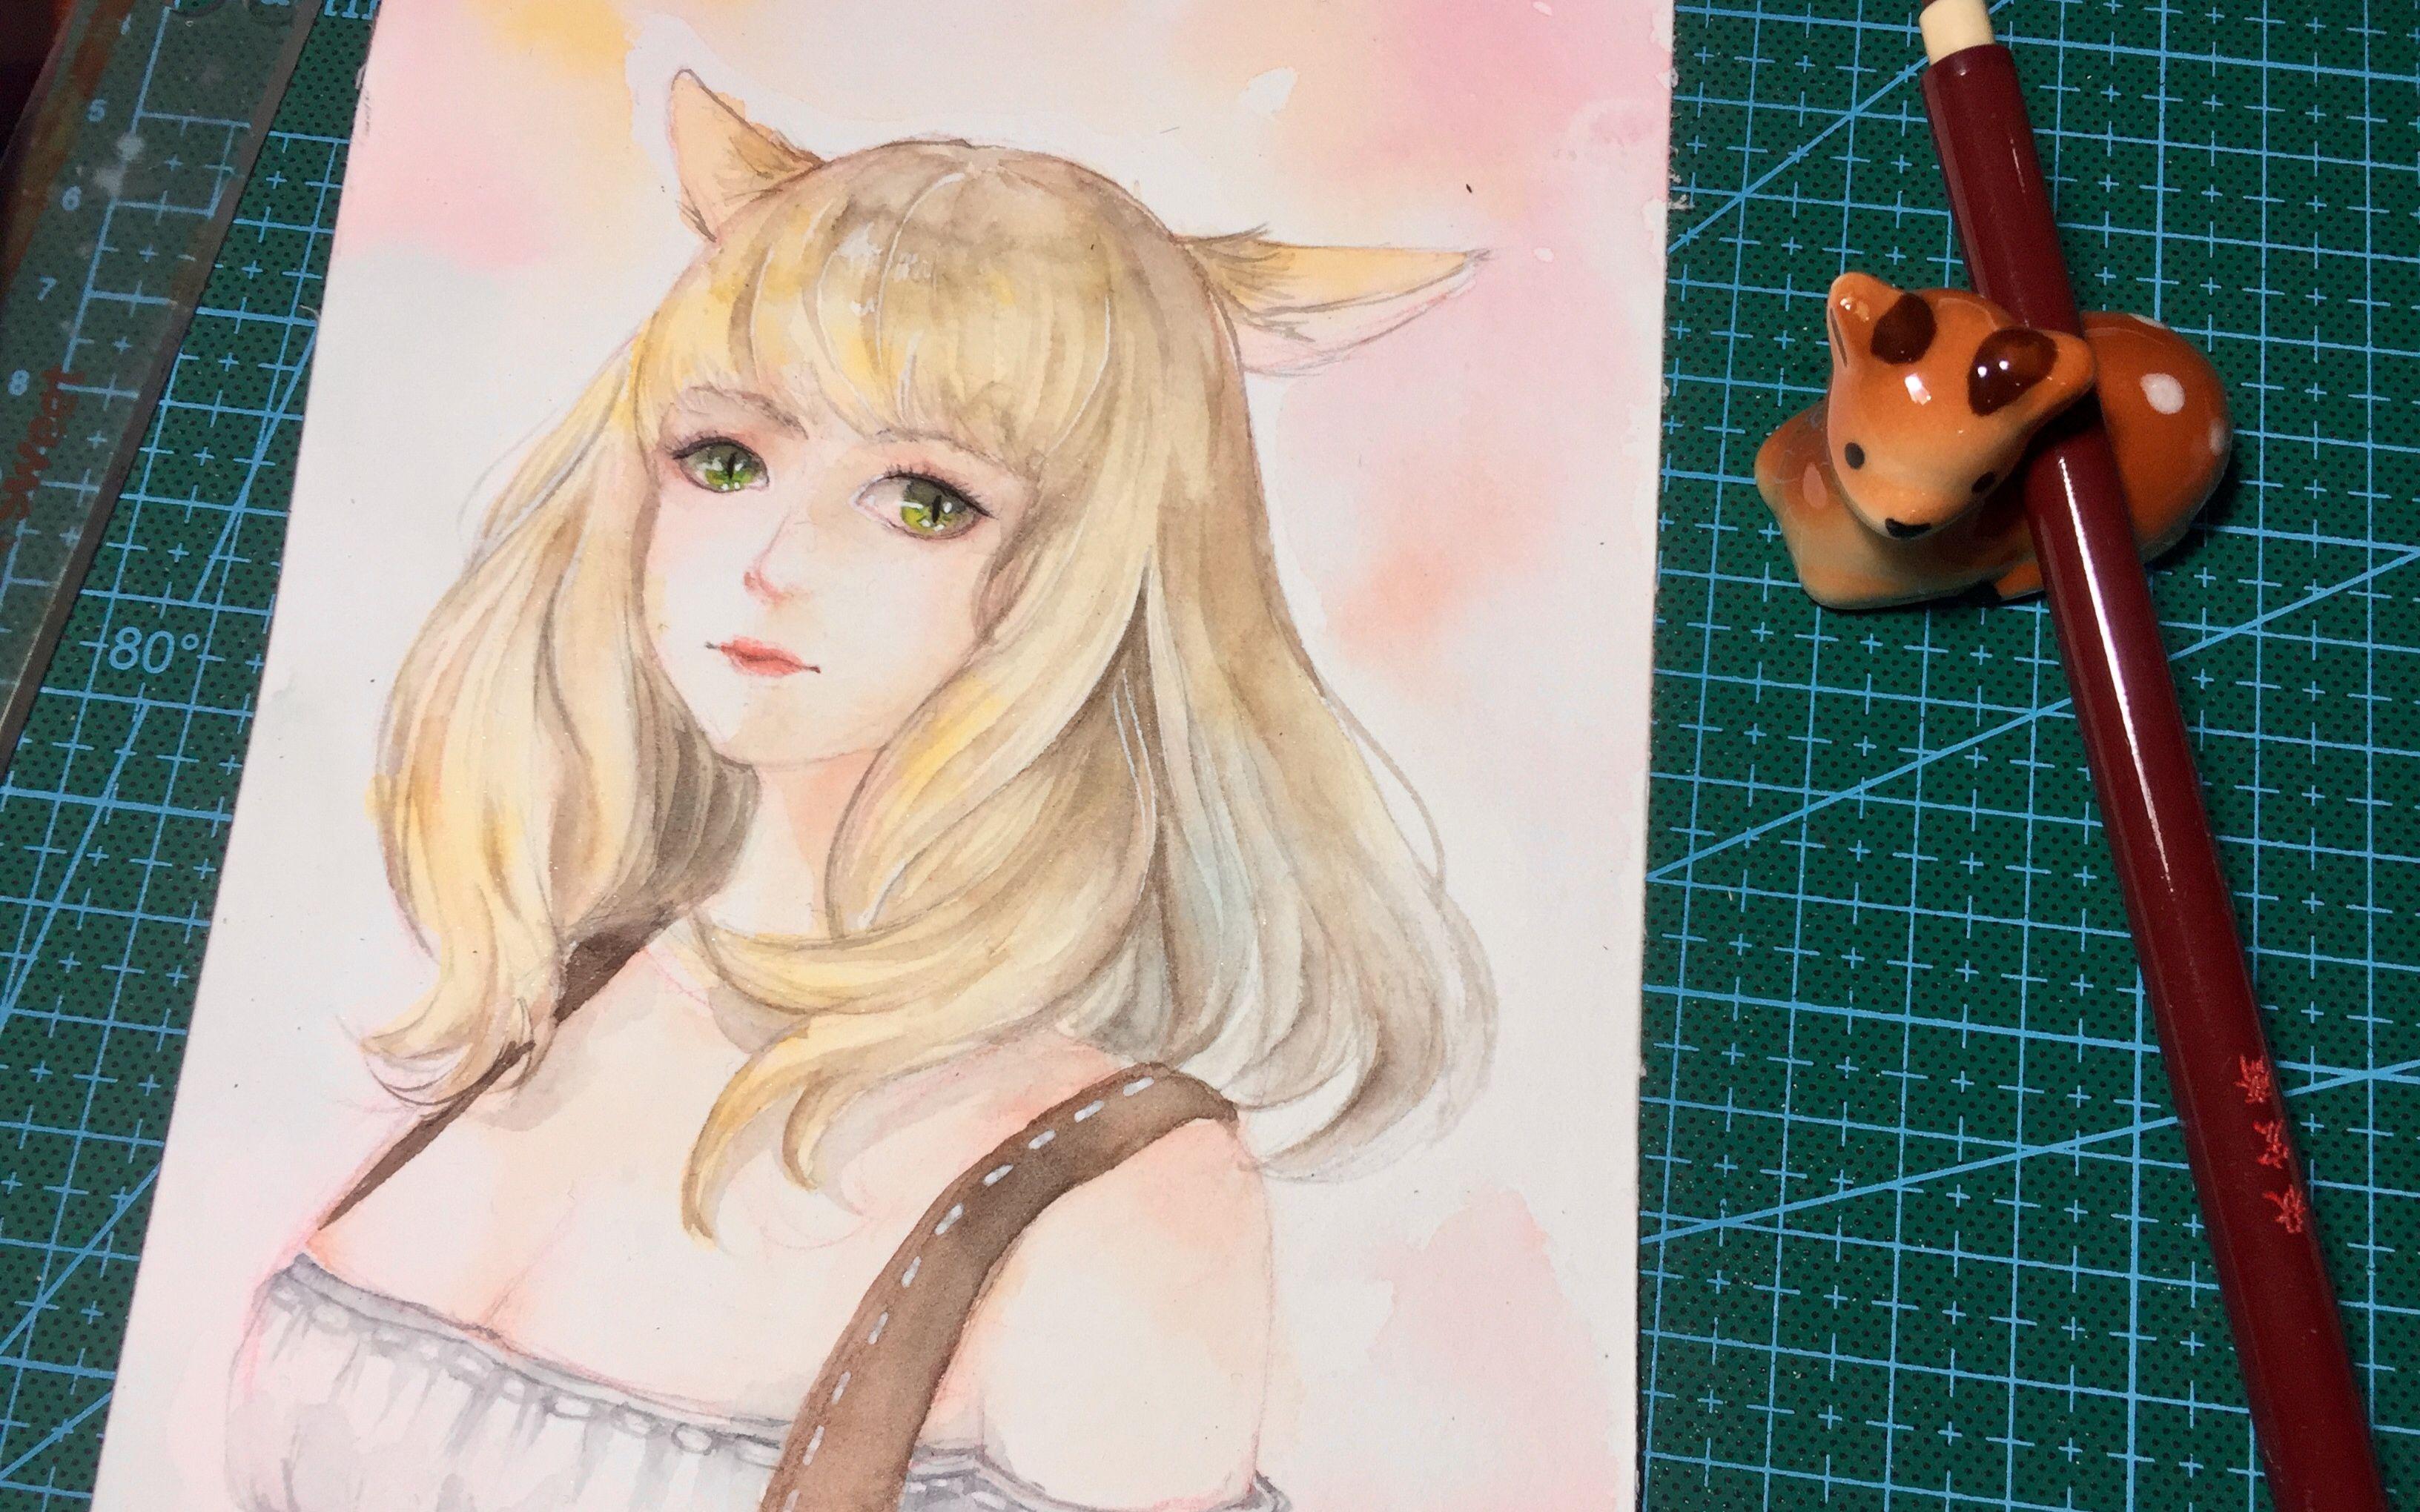 lulu酱【手绘水彩】喵喵喵~画一个最终幻想14猫女~(≥